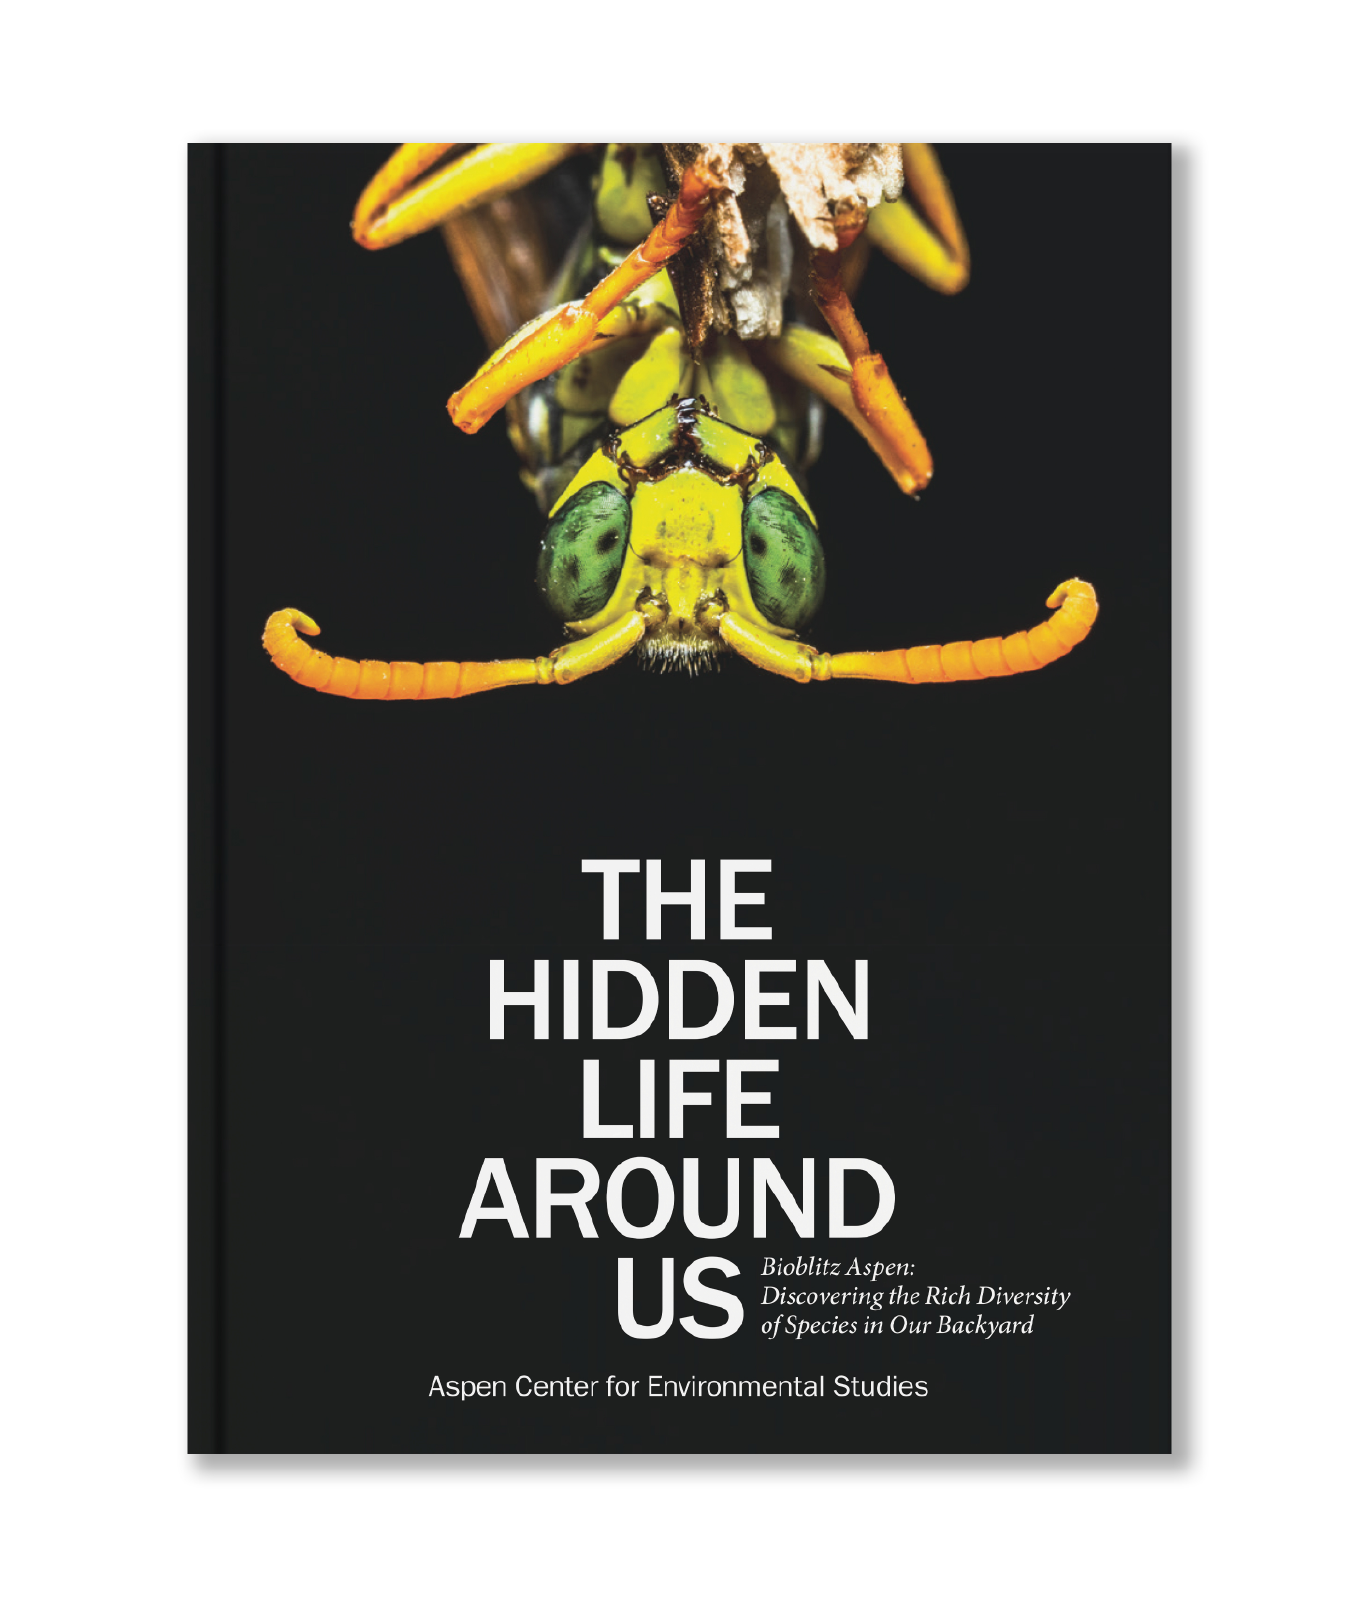 The Hidden Life Around Us: Bioblitz Aspen, Exploring the Rich Diversity of Species in Our Backyard